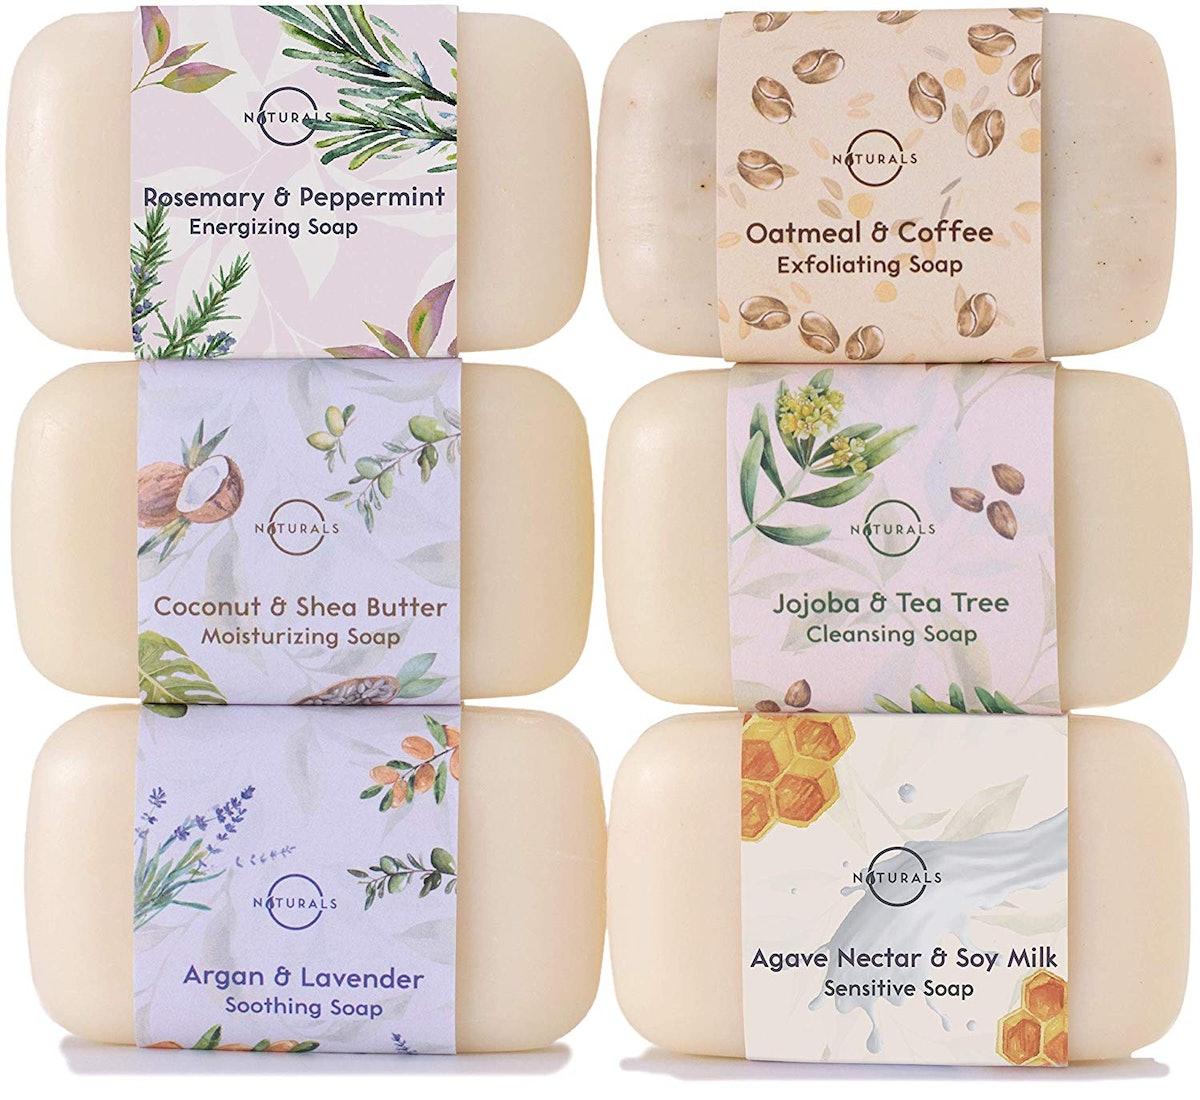 O Naturals 6 Piece Moisturizing Body Wash Bar Soap Collection